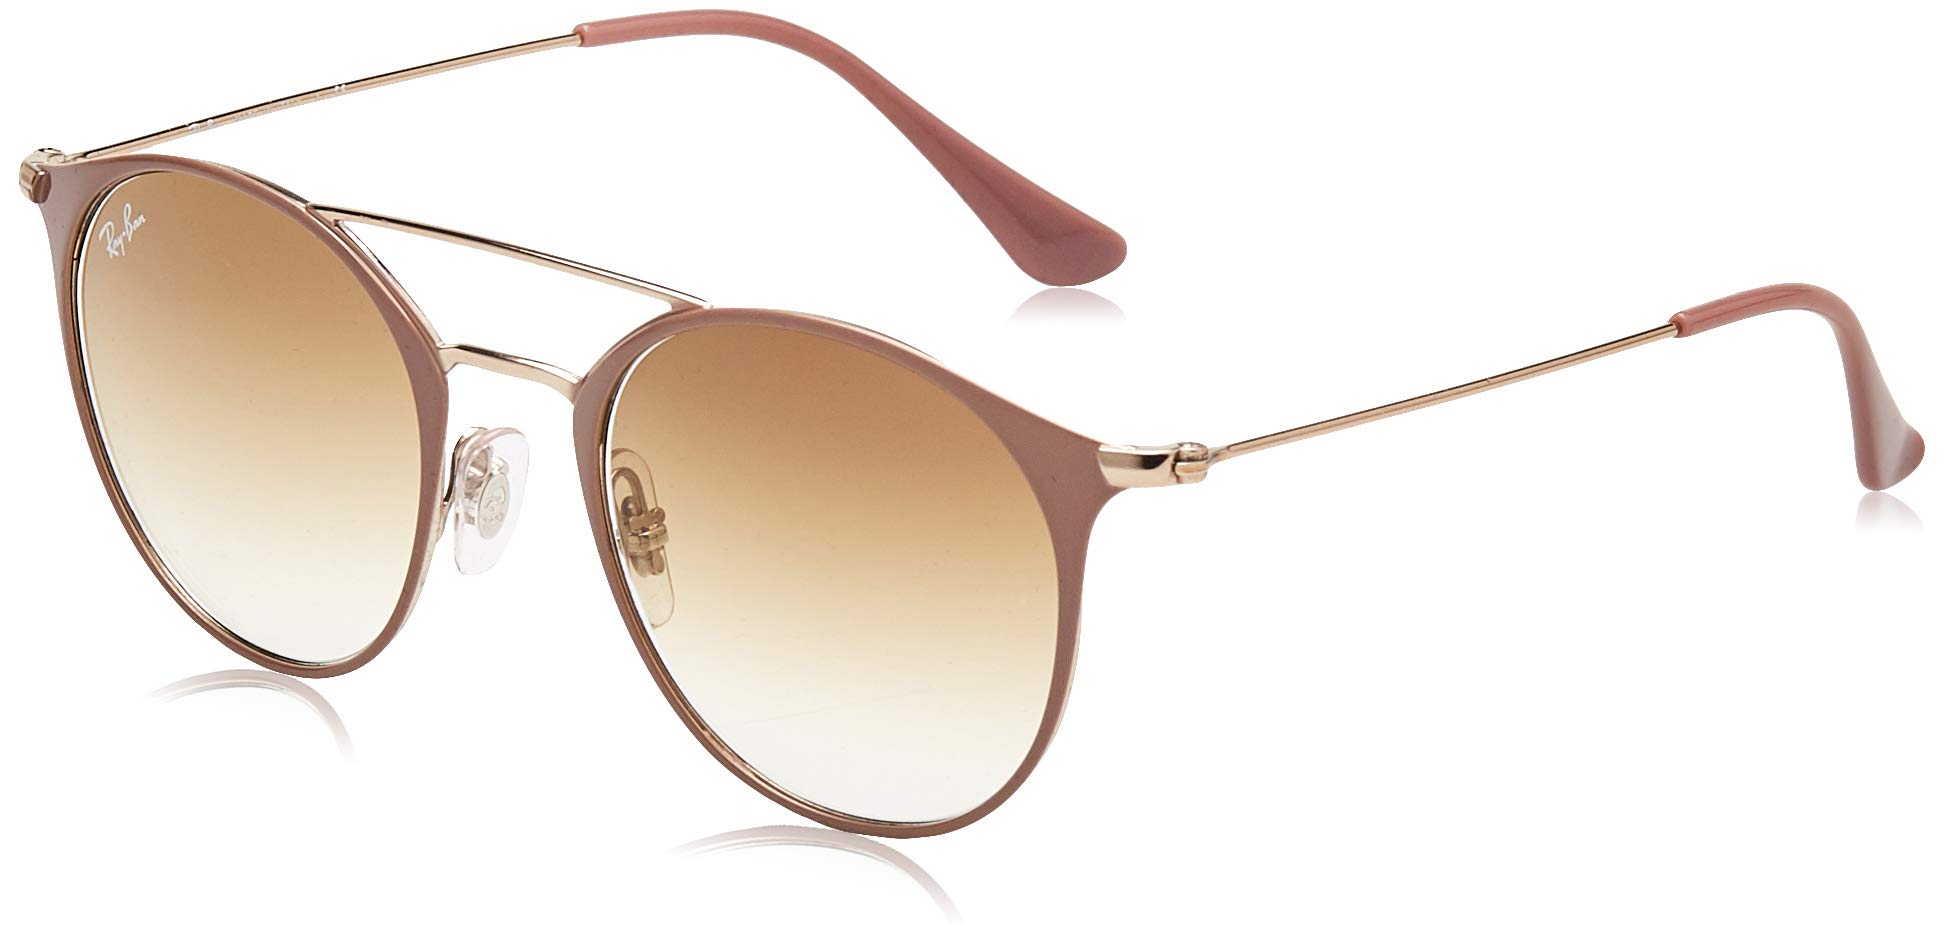 Ray-Ban unisex-adult Rb3546 Round Metal Sunglasses Round Sunglasses